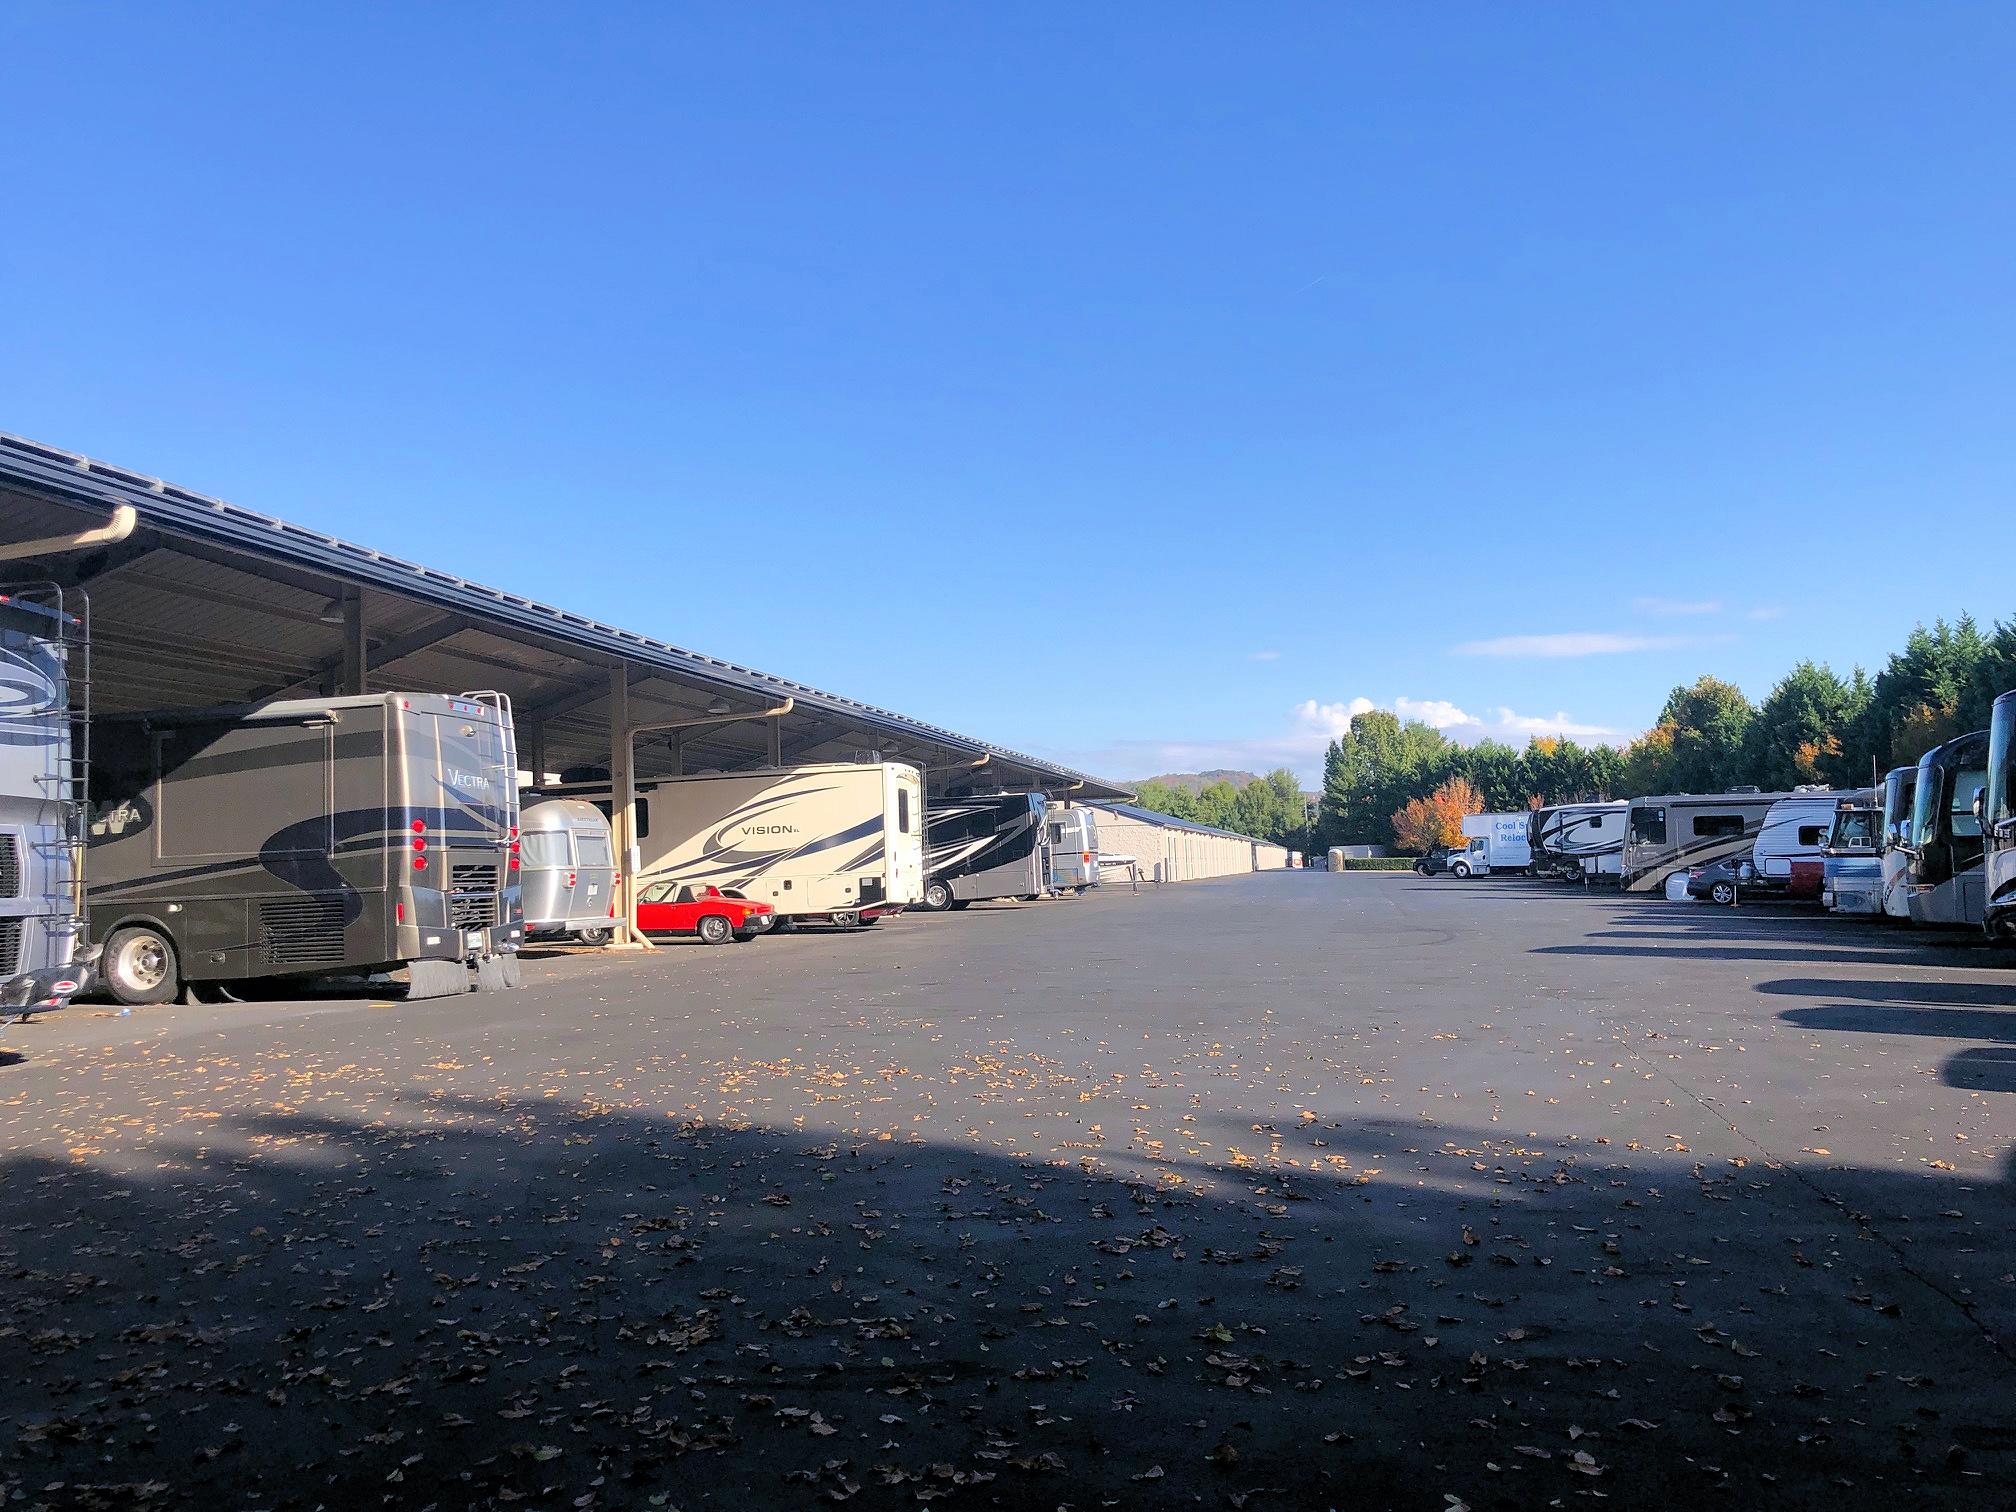 RV Parking in Franklin, TN